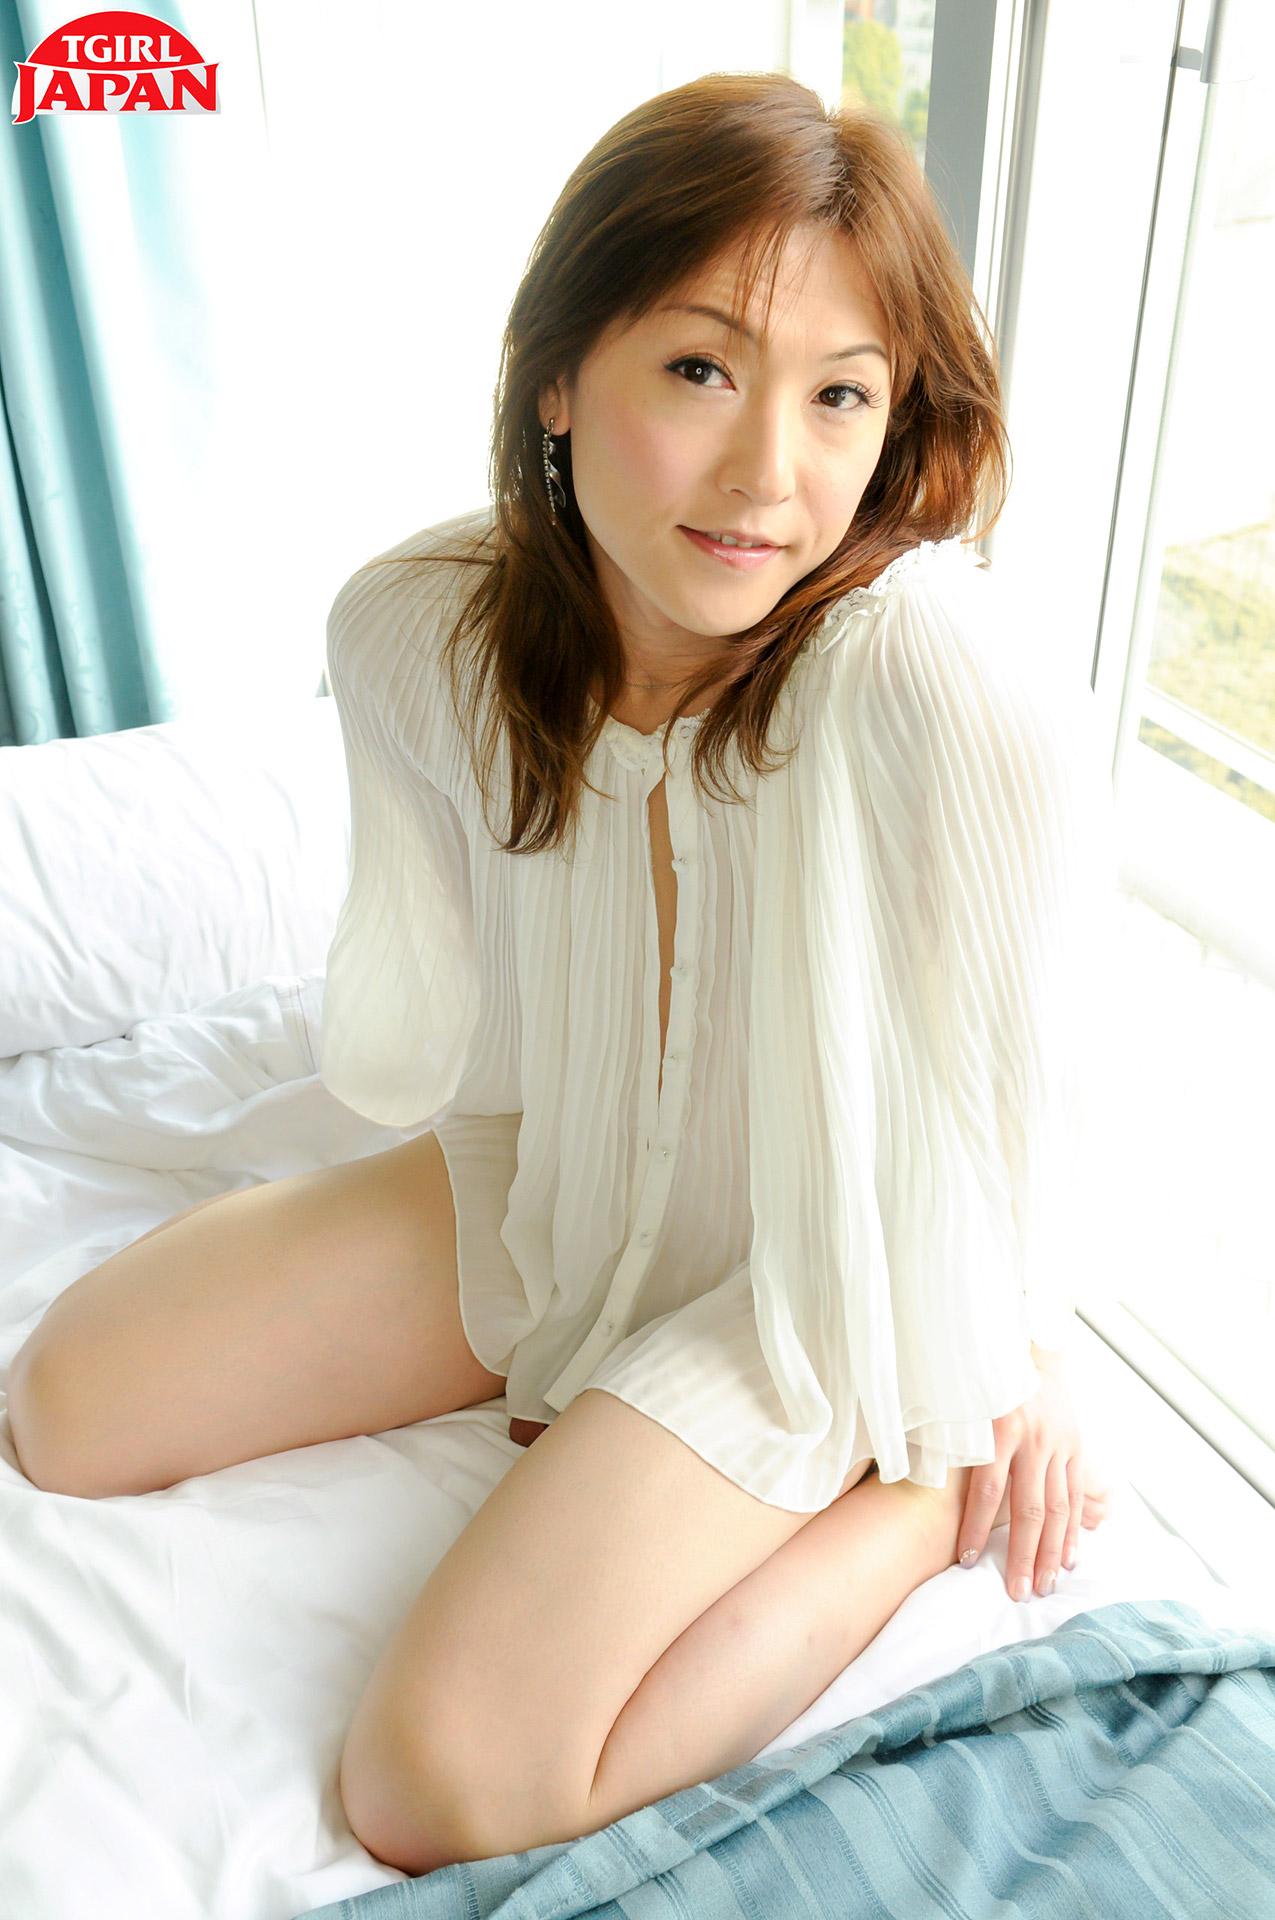 JavBukkake Japanese PornTube トガール・綾瀬真央 Tgirljapan Tgirl